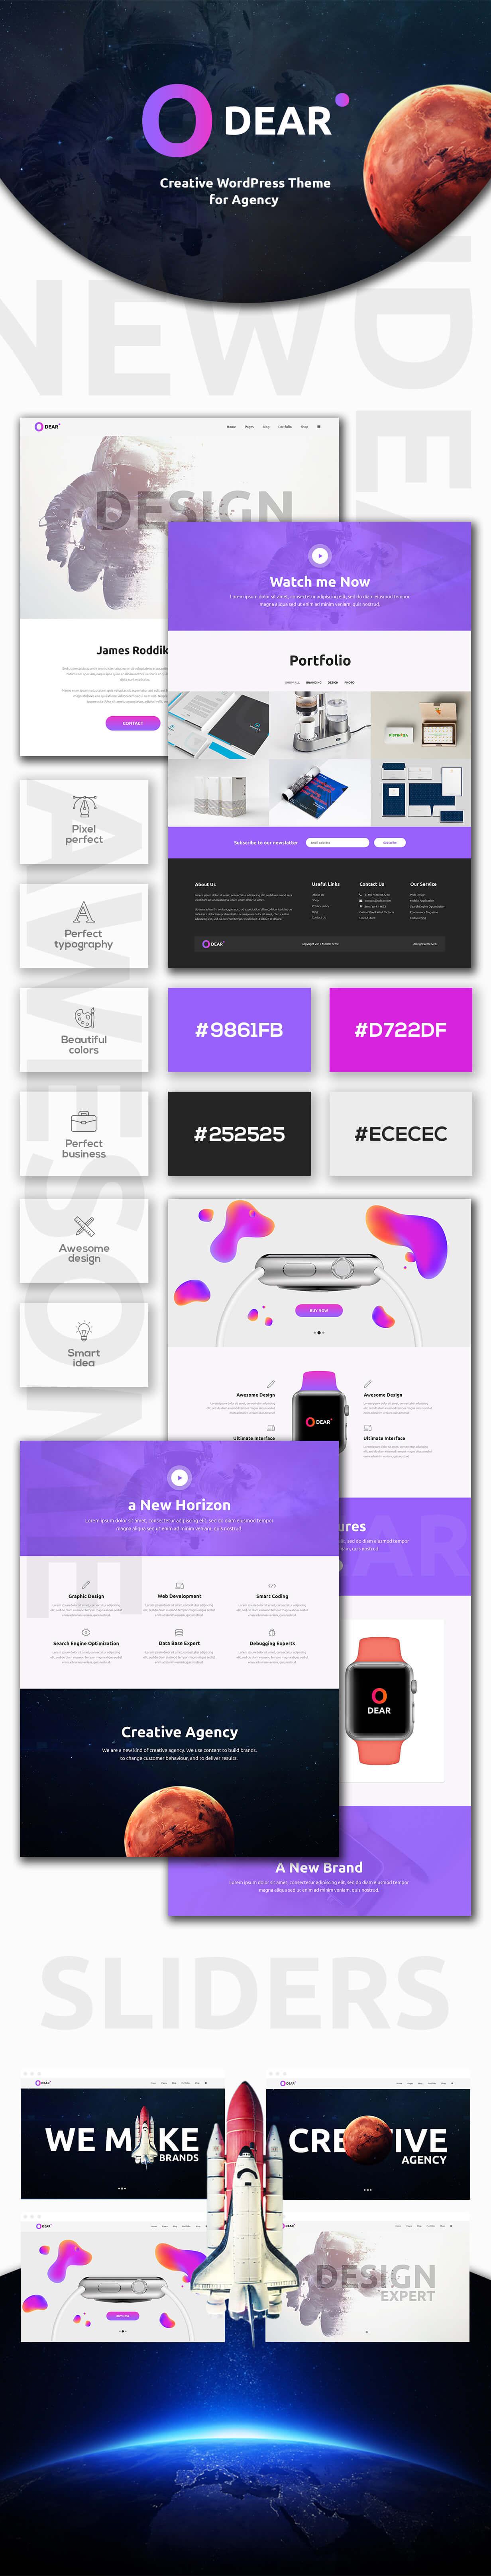 Odear - Multi-Concept Creative WordPress Theme - 1